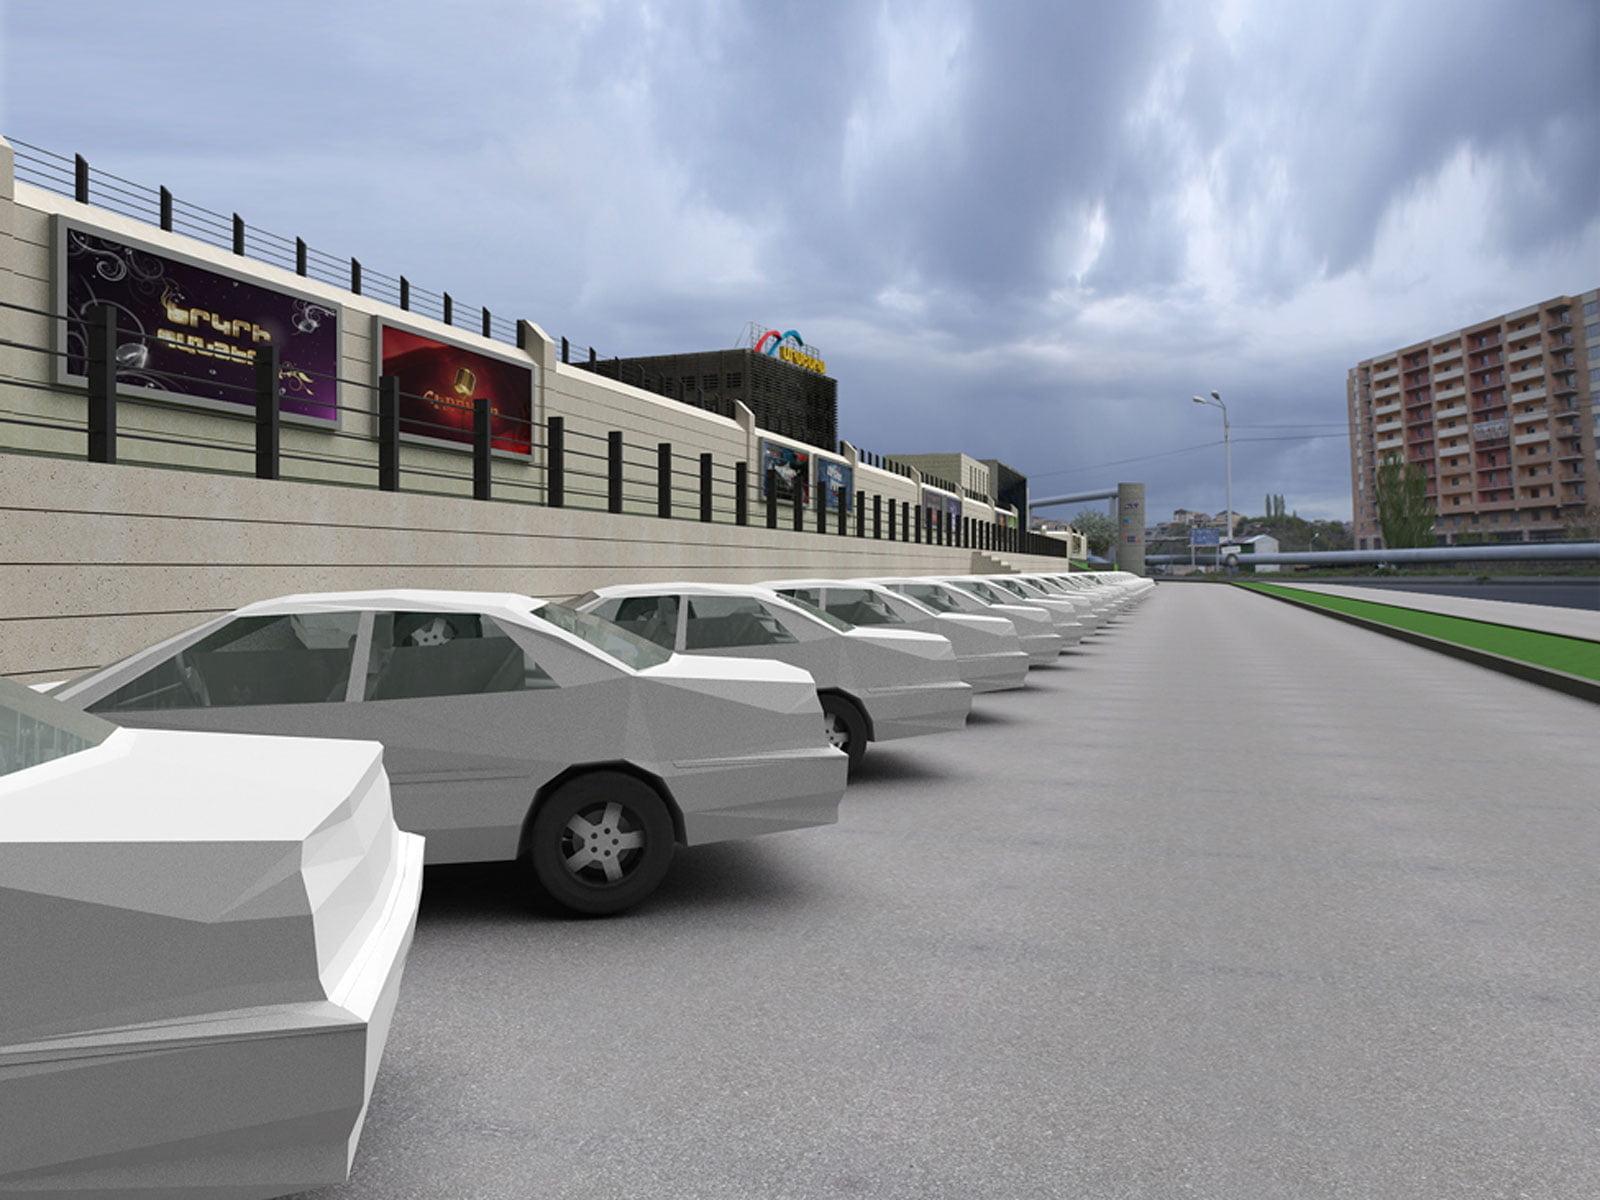 kartinka vizualizatsii (parking) zdaniya i territorii Armenia-TV